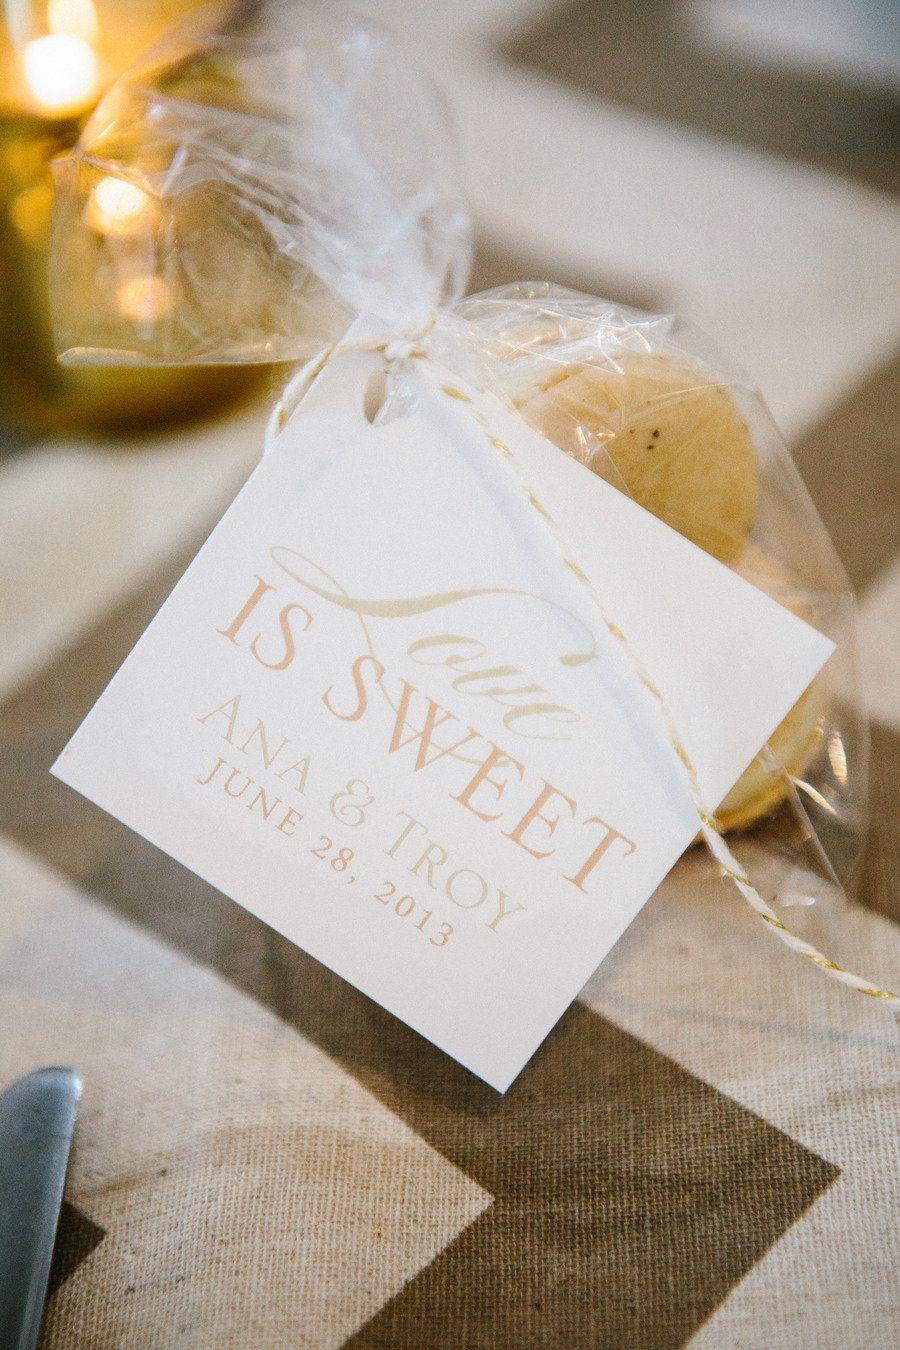 Riverside Wedding from Kayla Adams | Kayla adams, Floral designs and ...